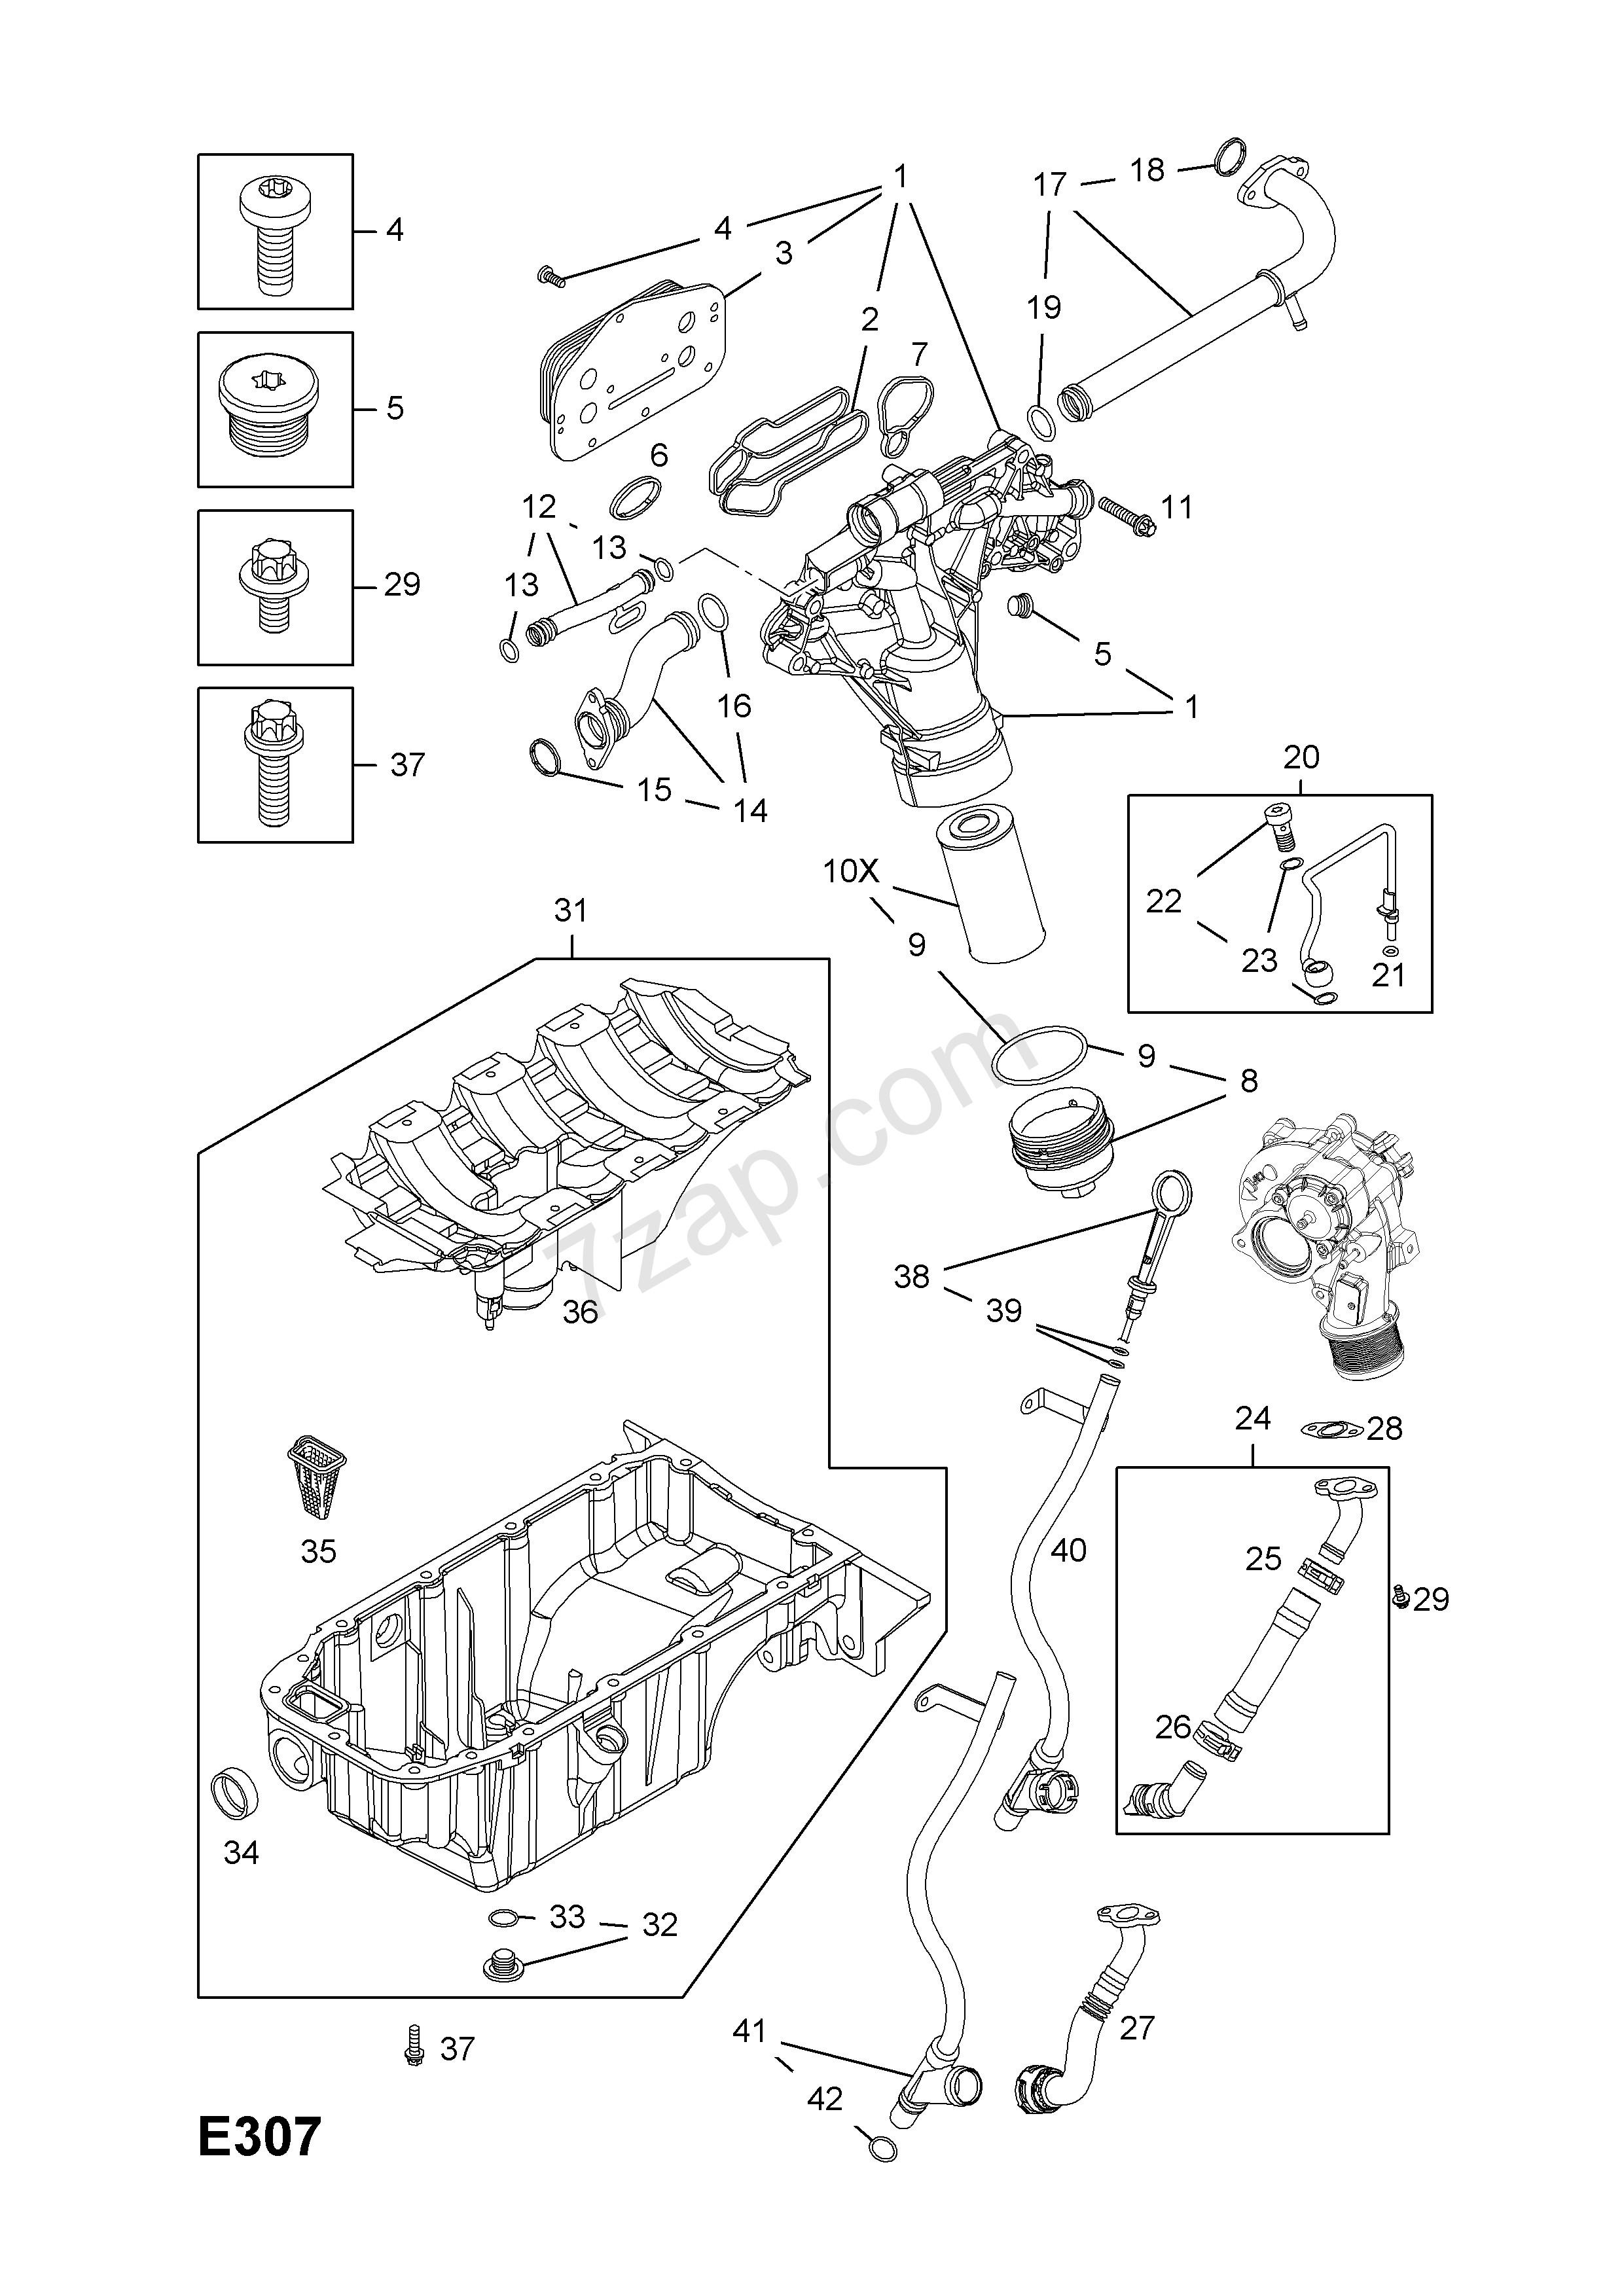 vauxhall corsa timing chain diagram trailer brake controller wiring engine oil level sensor please